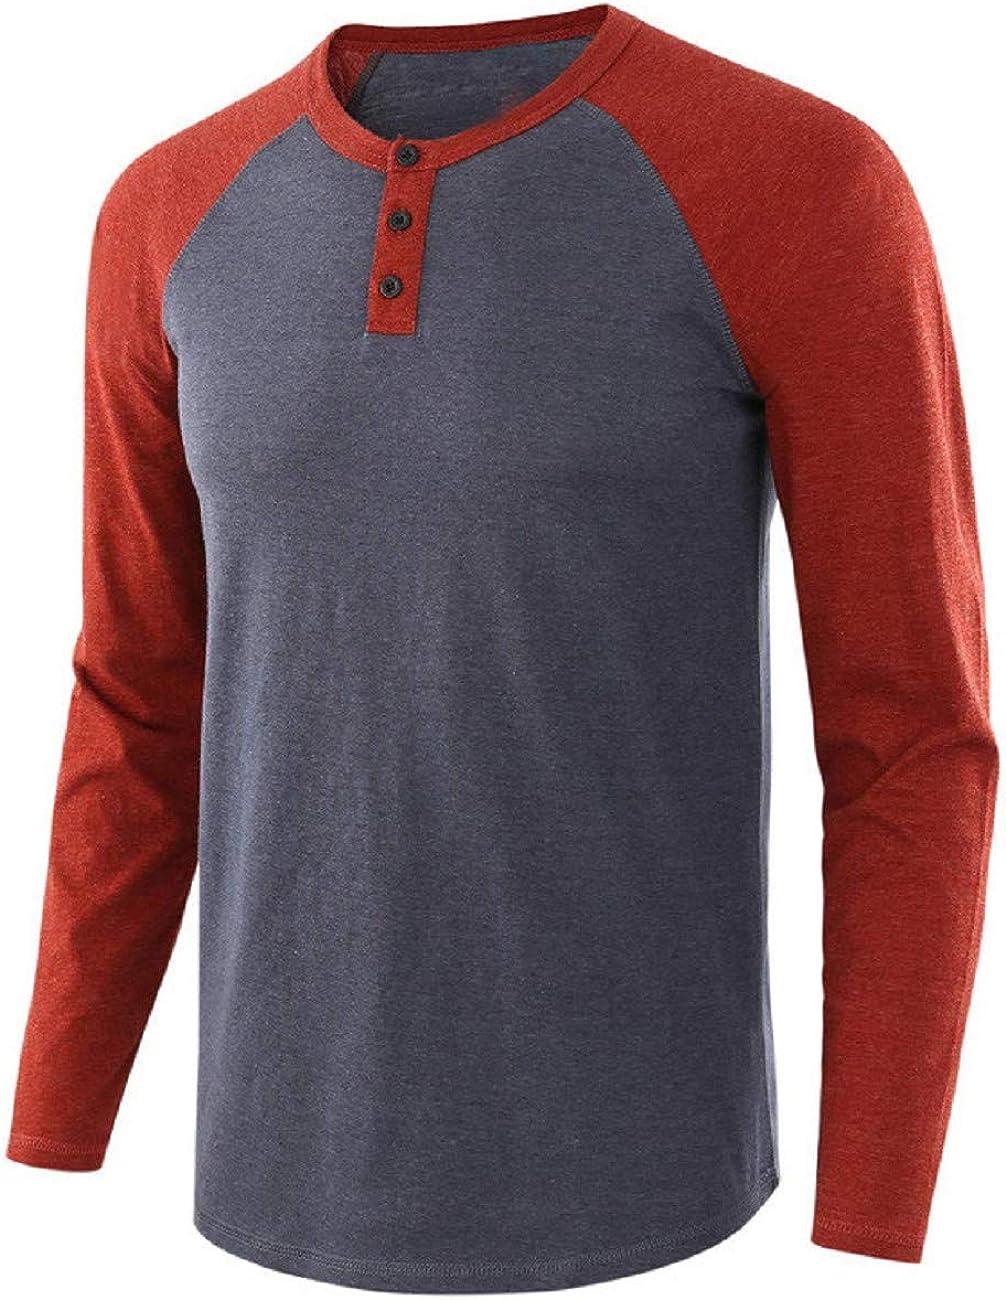 FAPIZI Mens Casual Vintage Long Sleeve Raglan Henley Shirts Baseball T-Shirt Hipster T Shirts Slim Fit Muscle Pullover